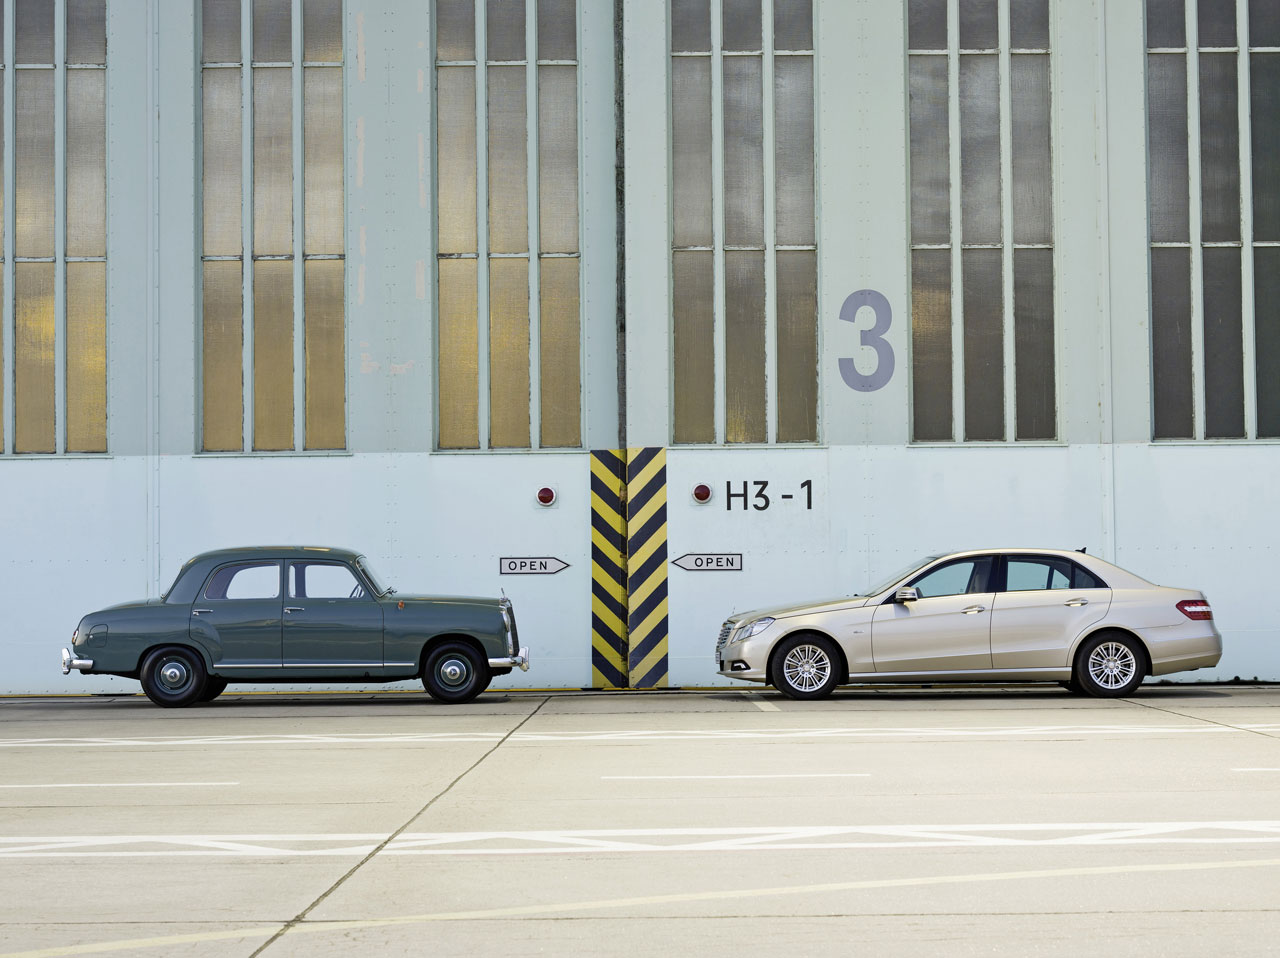 Mercedes benz e class model history car body design for Mercedes benz model history